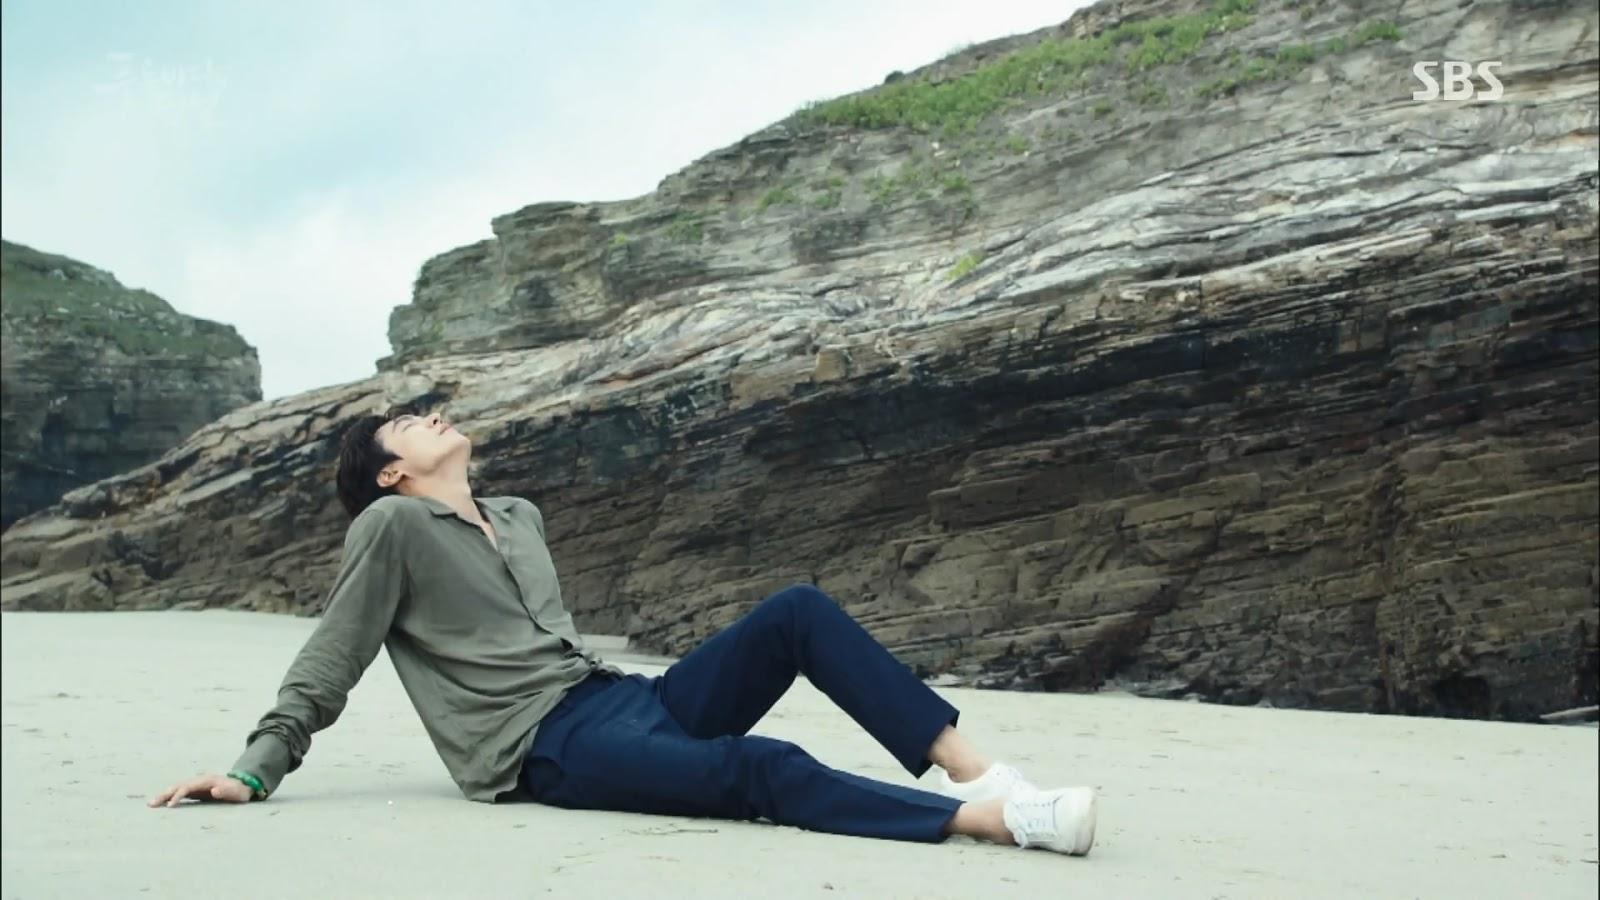 Screenshot Joon Jea Wake Up Scene The Legend Of The Blu Sea (2016)  1080p Episode 03 - www.uchiha-uzuma.com